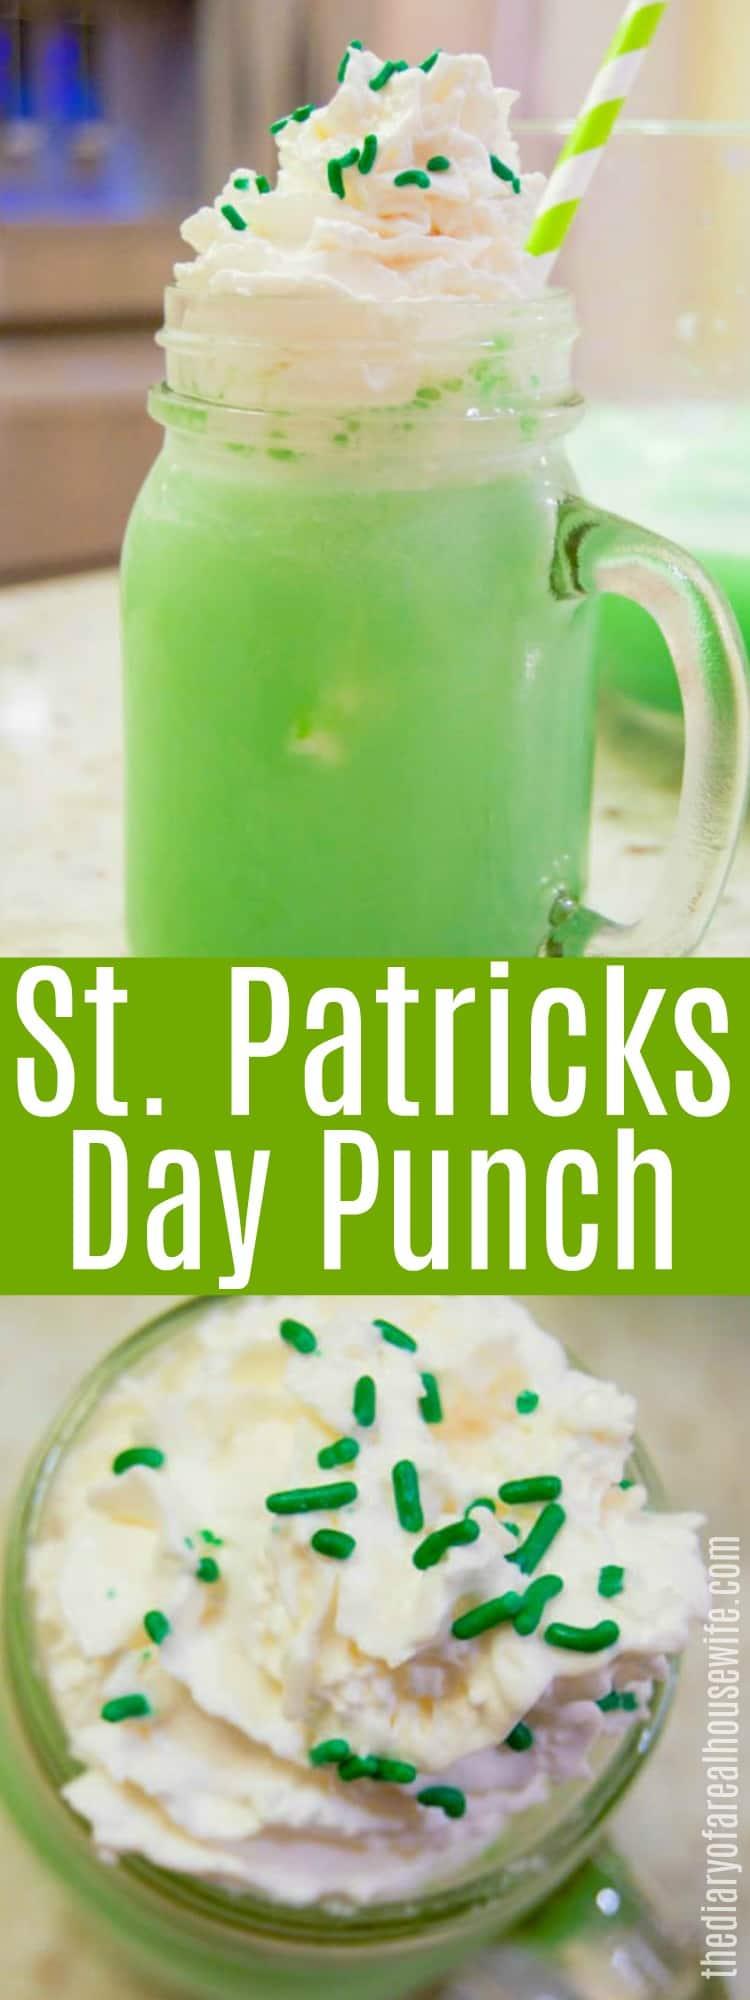 St.-Patricks-Day-Punch.jpg